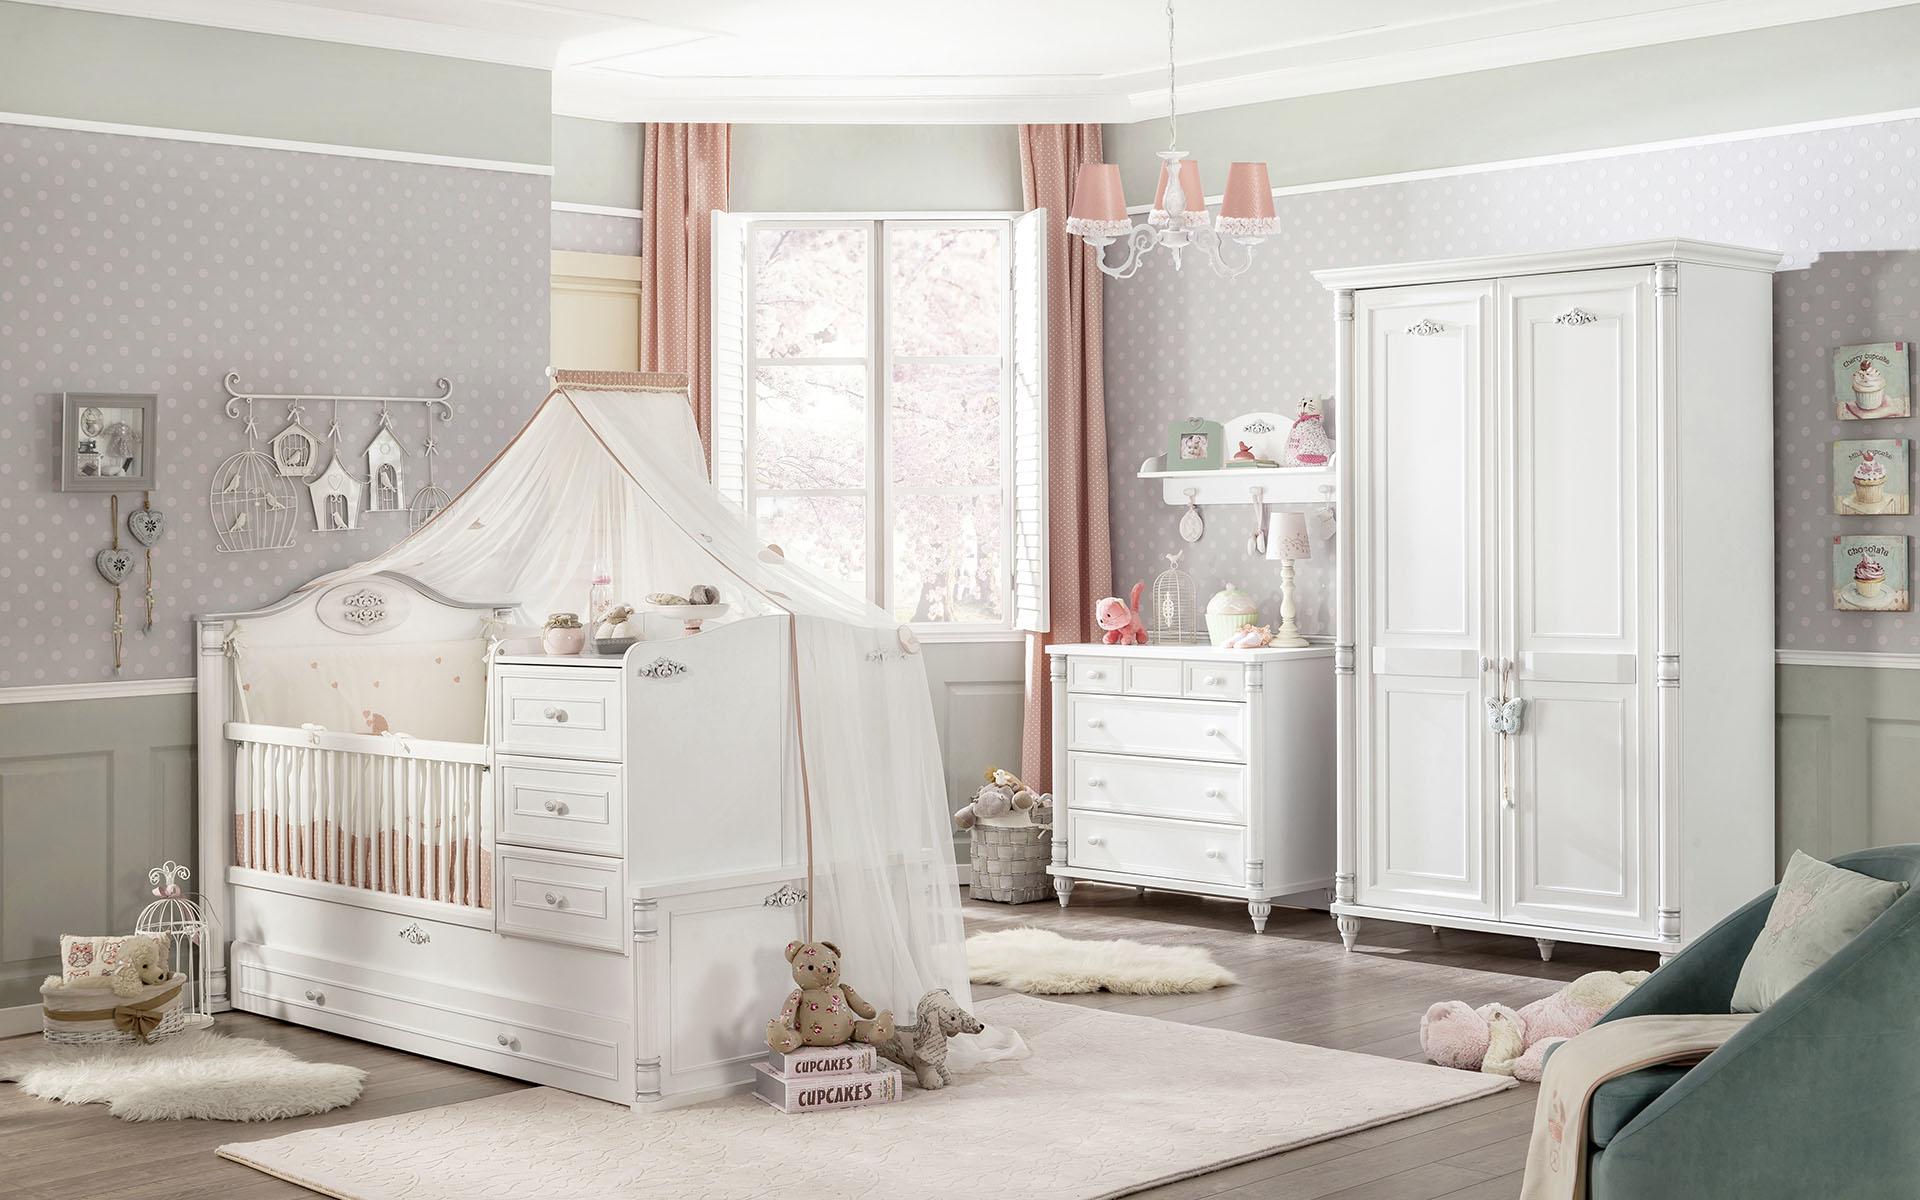 Sparset Komplettzimmer 5 Tlg Babyamore Traum Mobel Com